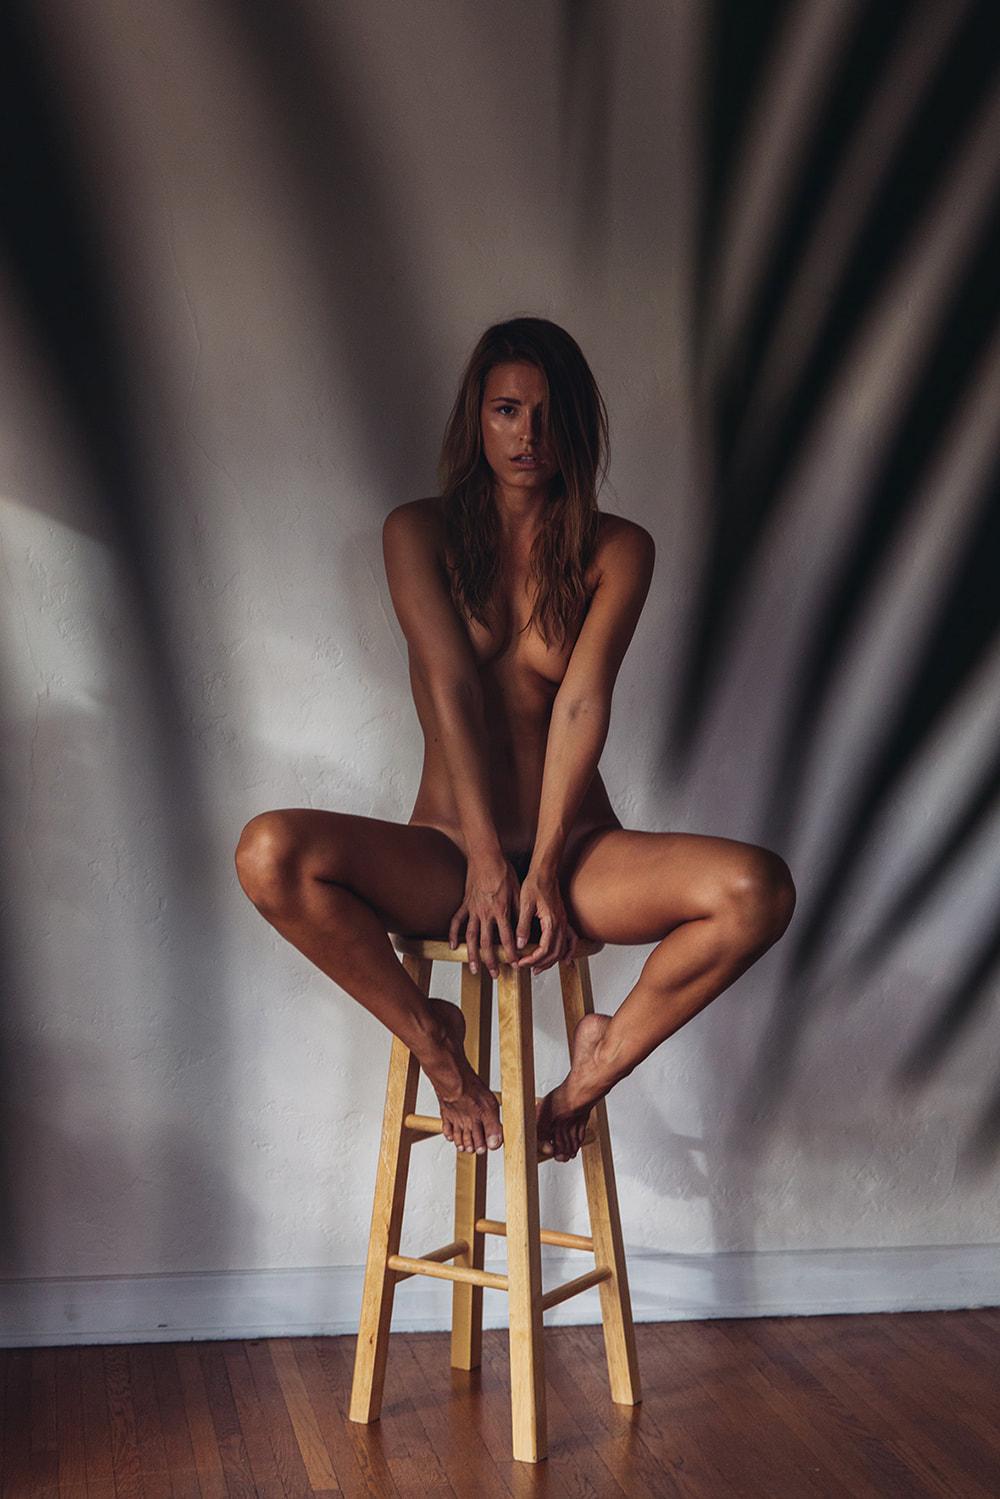 Marisa Papen by Neave Bozorgi